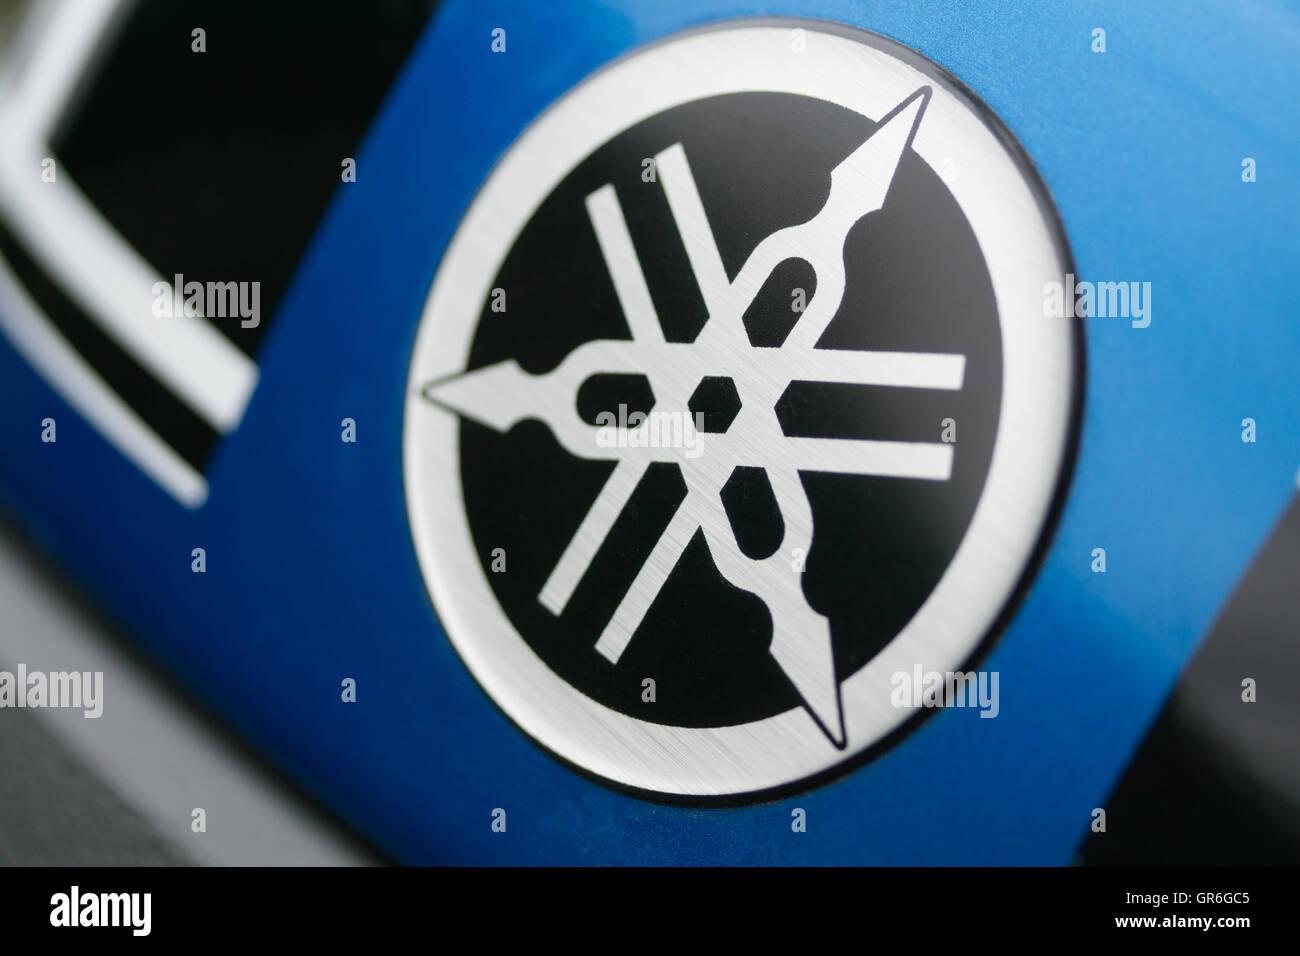 Company logo of the Yamaha Motor Company Limited set on a Tenere xt660Z motorcycle.